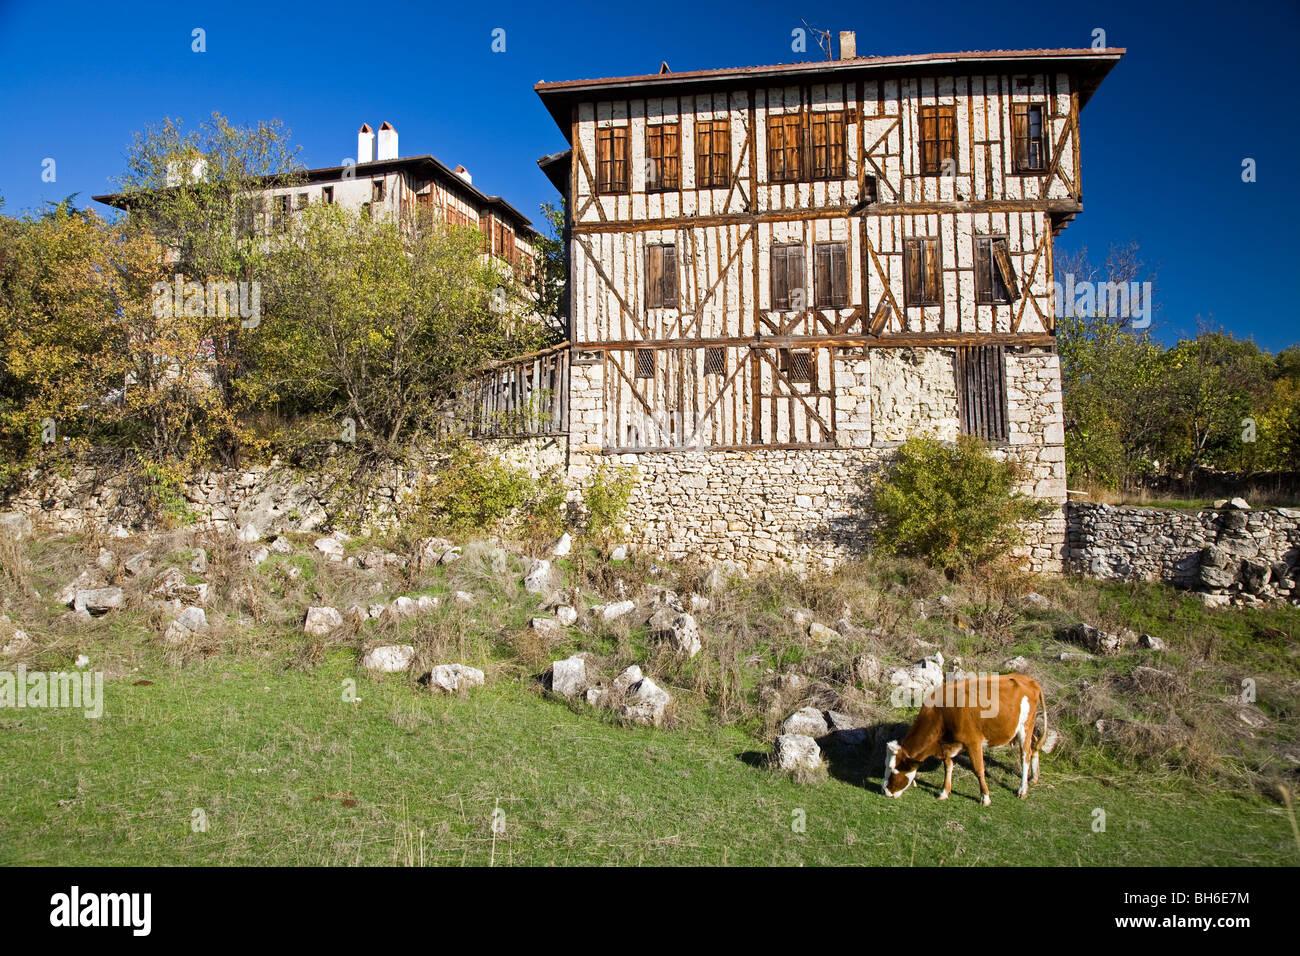 Detalles arquitectónicos de Safranbolu Turquía casas Imagen De Stock